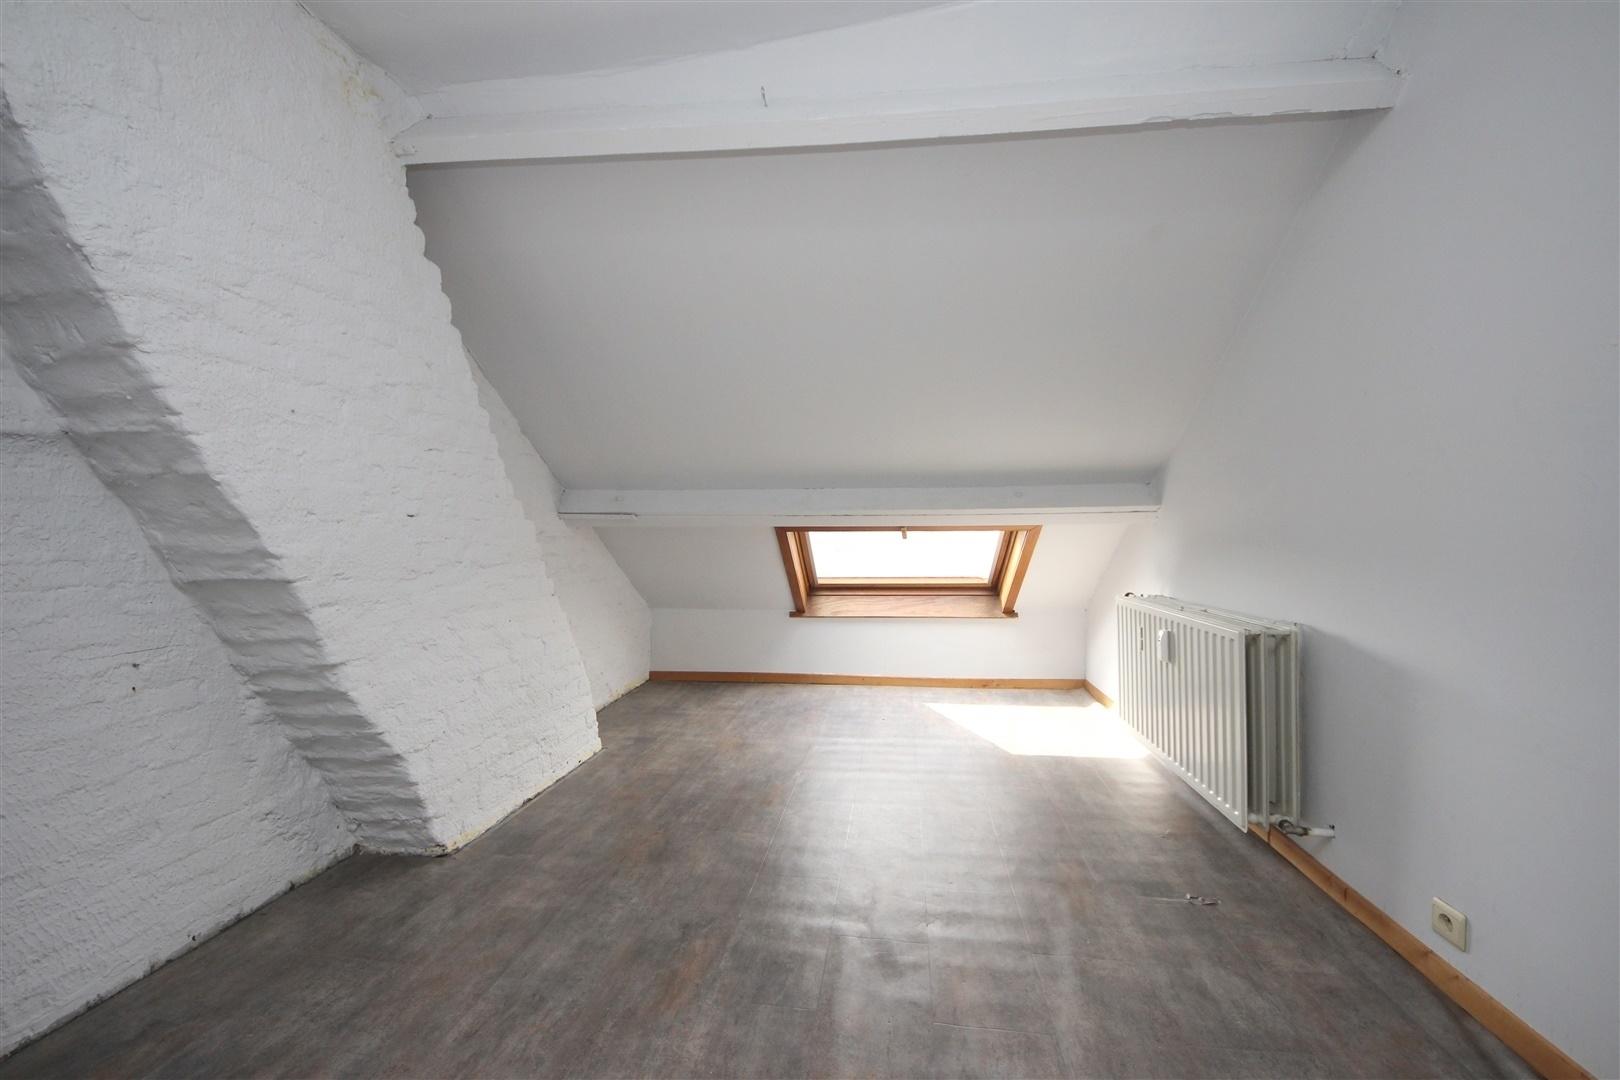 Duplex-appartement nabij Station Gent-Sint-Pieters